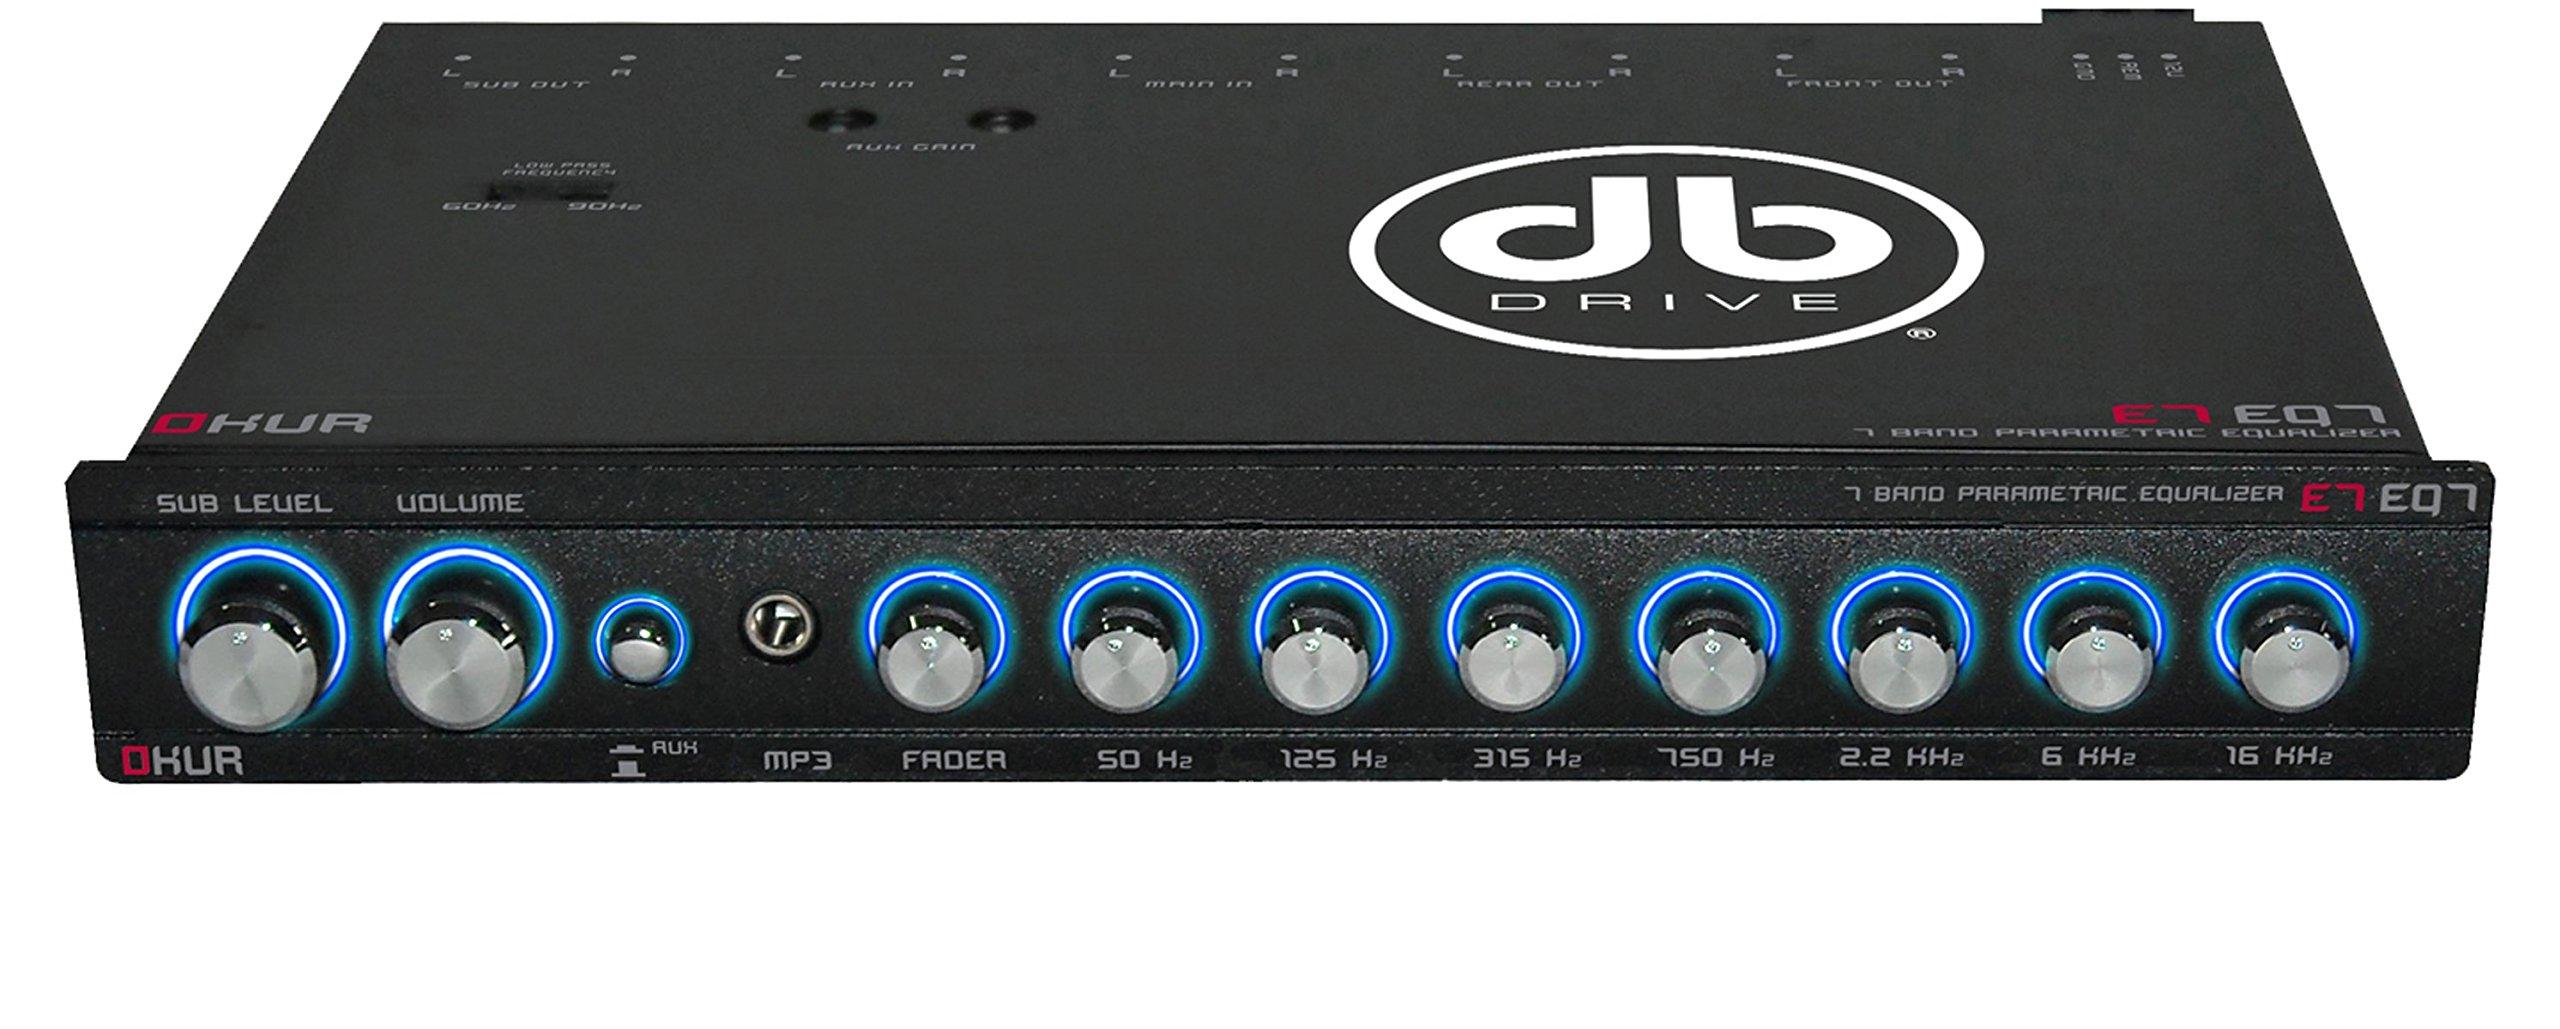 db Drive E7 EQ7 7-Band Equalizer